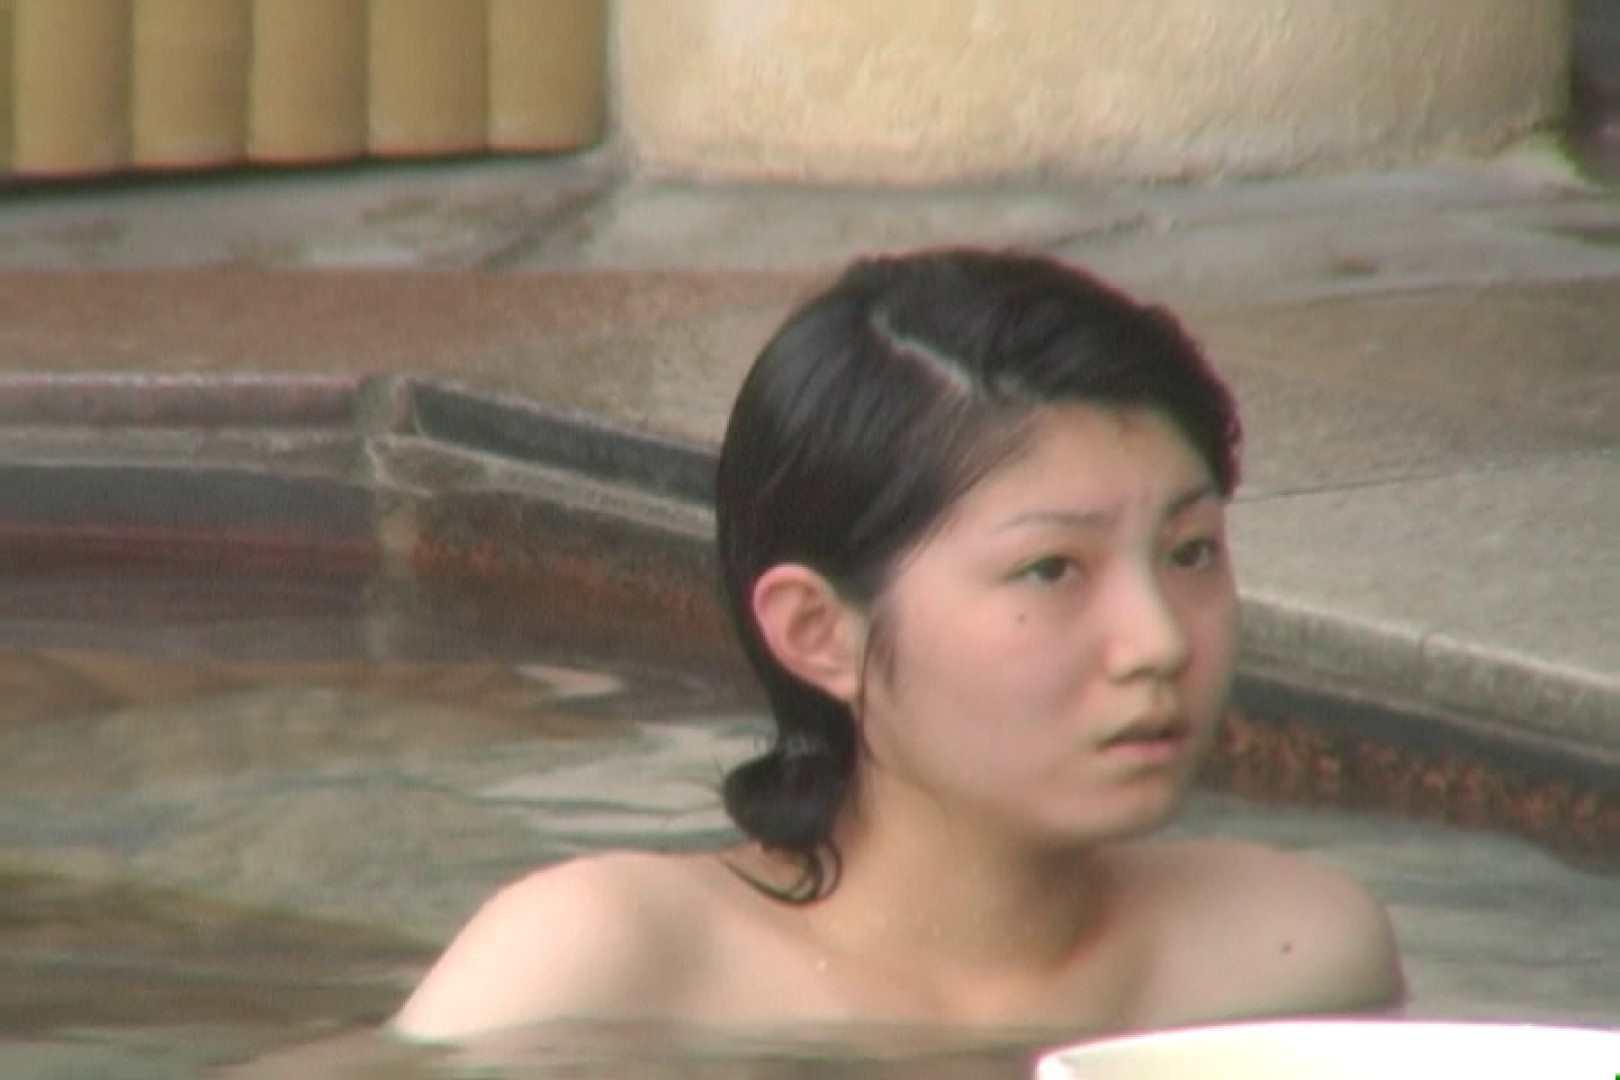 Aquaな露天風呂Vol.579 OL女体 | 露天  72連発 64